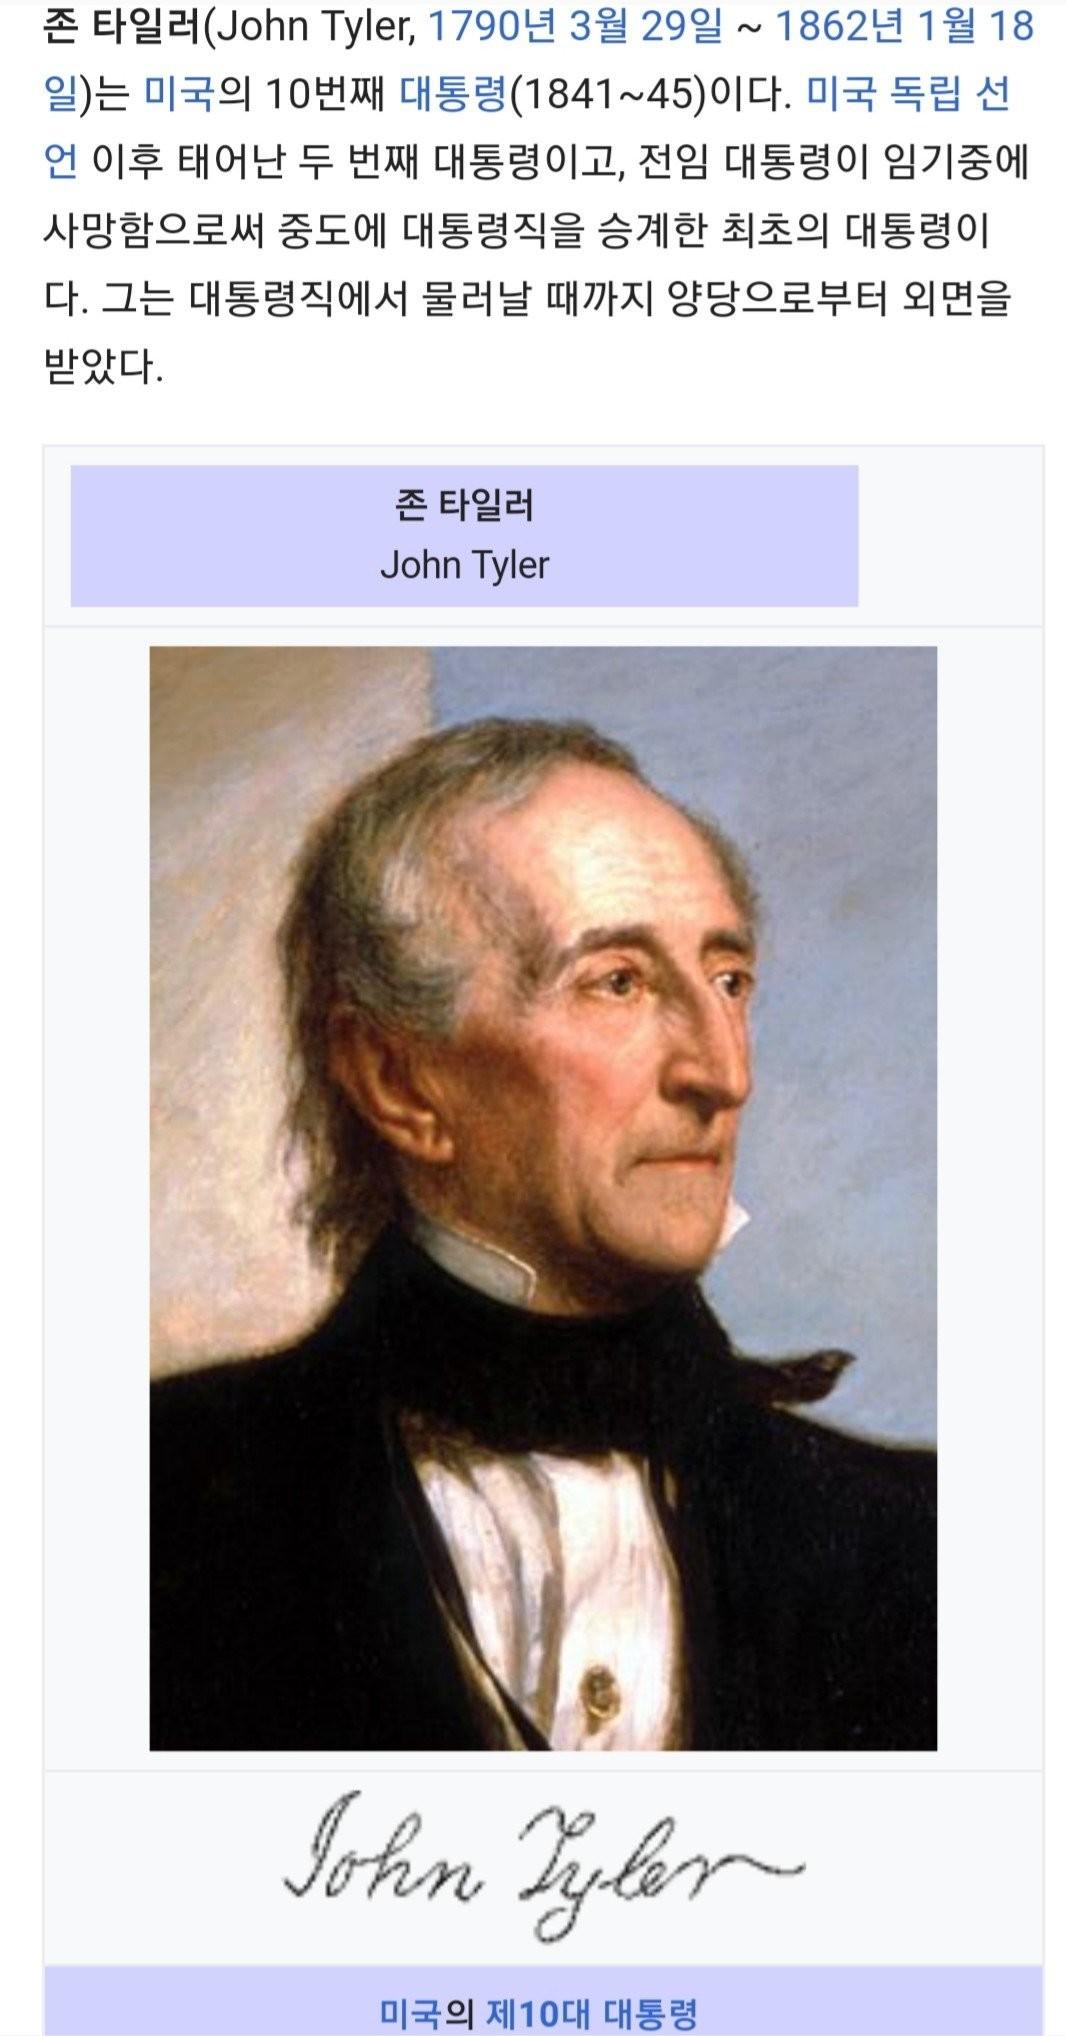 20180808_143258.jpg 18세기 출생자를 할아버지로 둔 미국인들.jpg